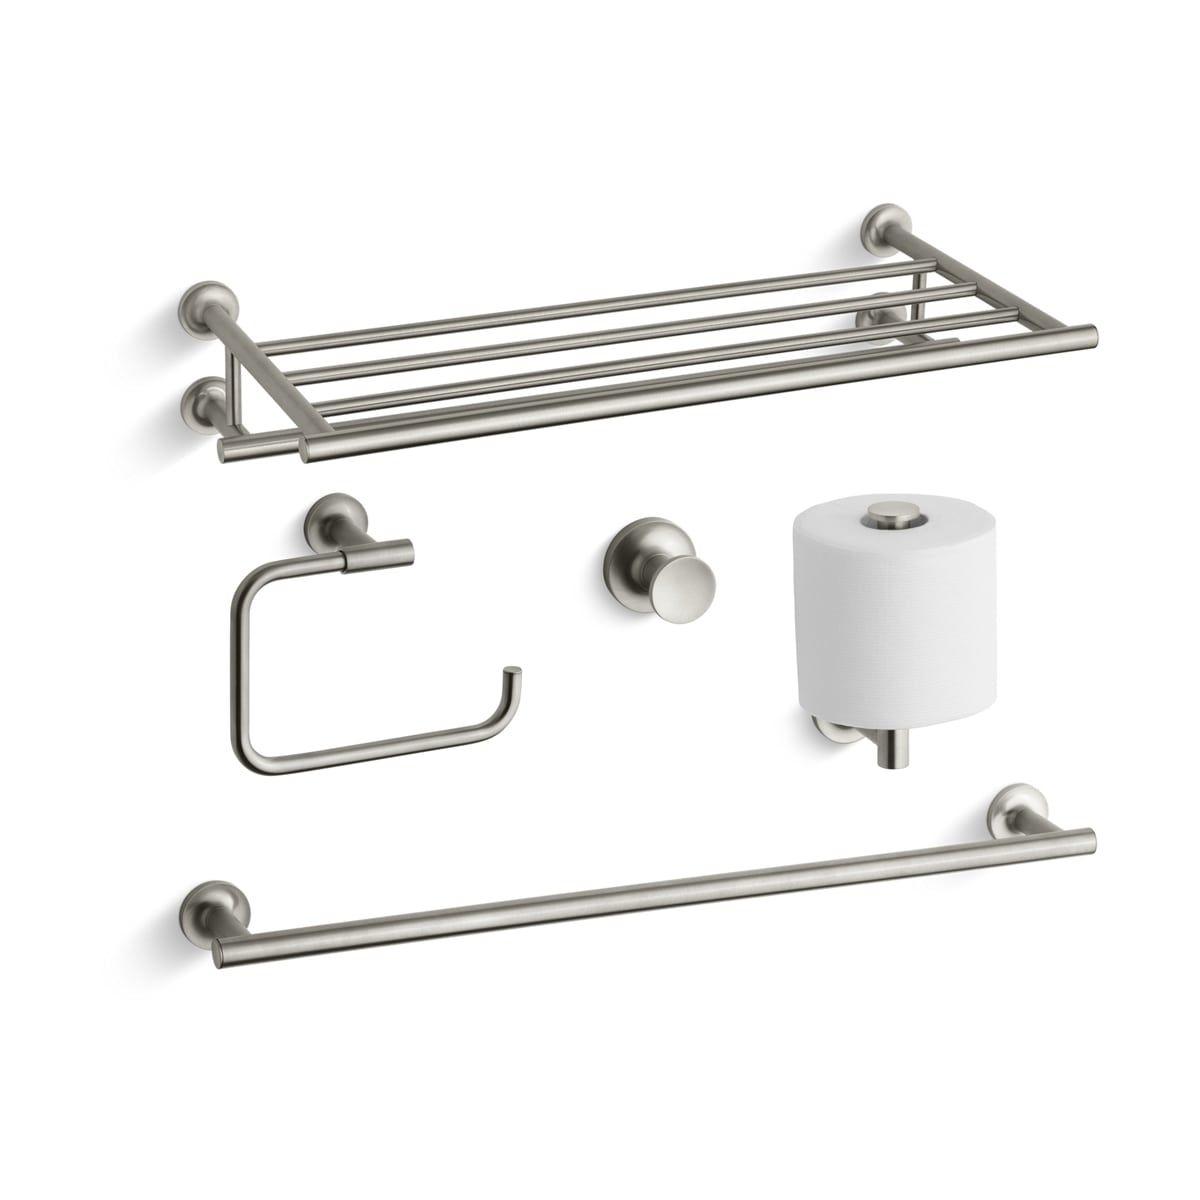 Bath Accessories Kohler Purist With Hotelier Towel Rack Kohler Purist Towel Bar